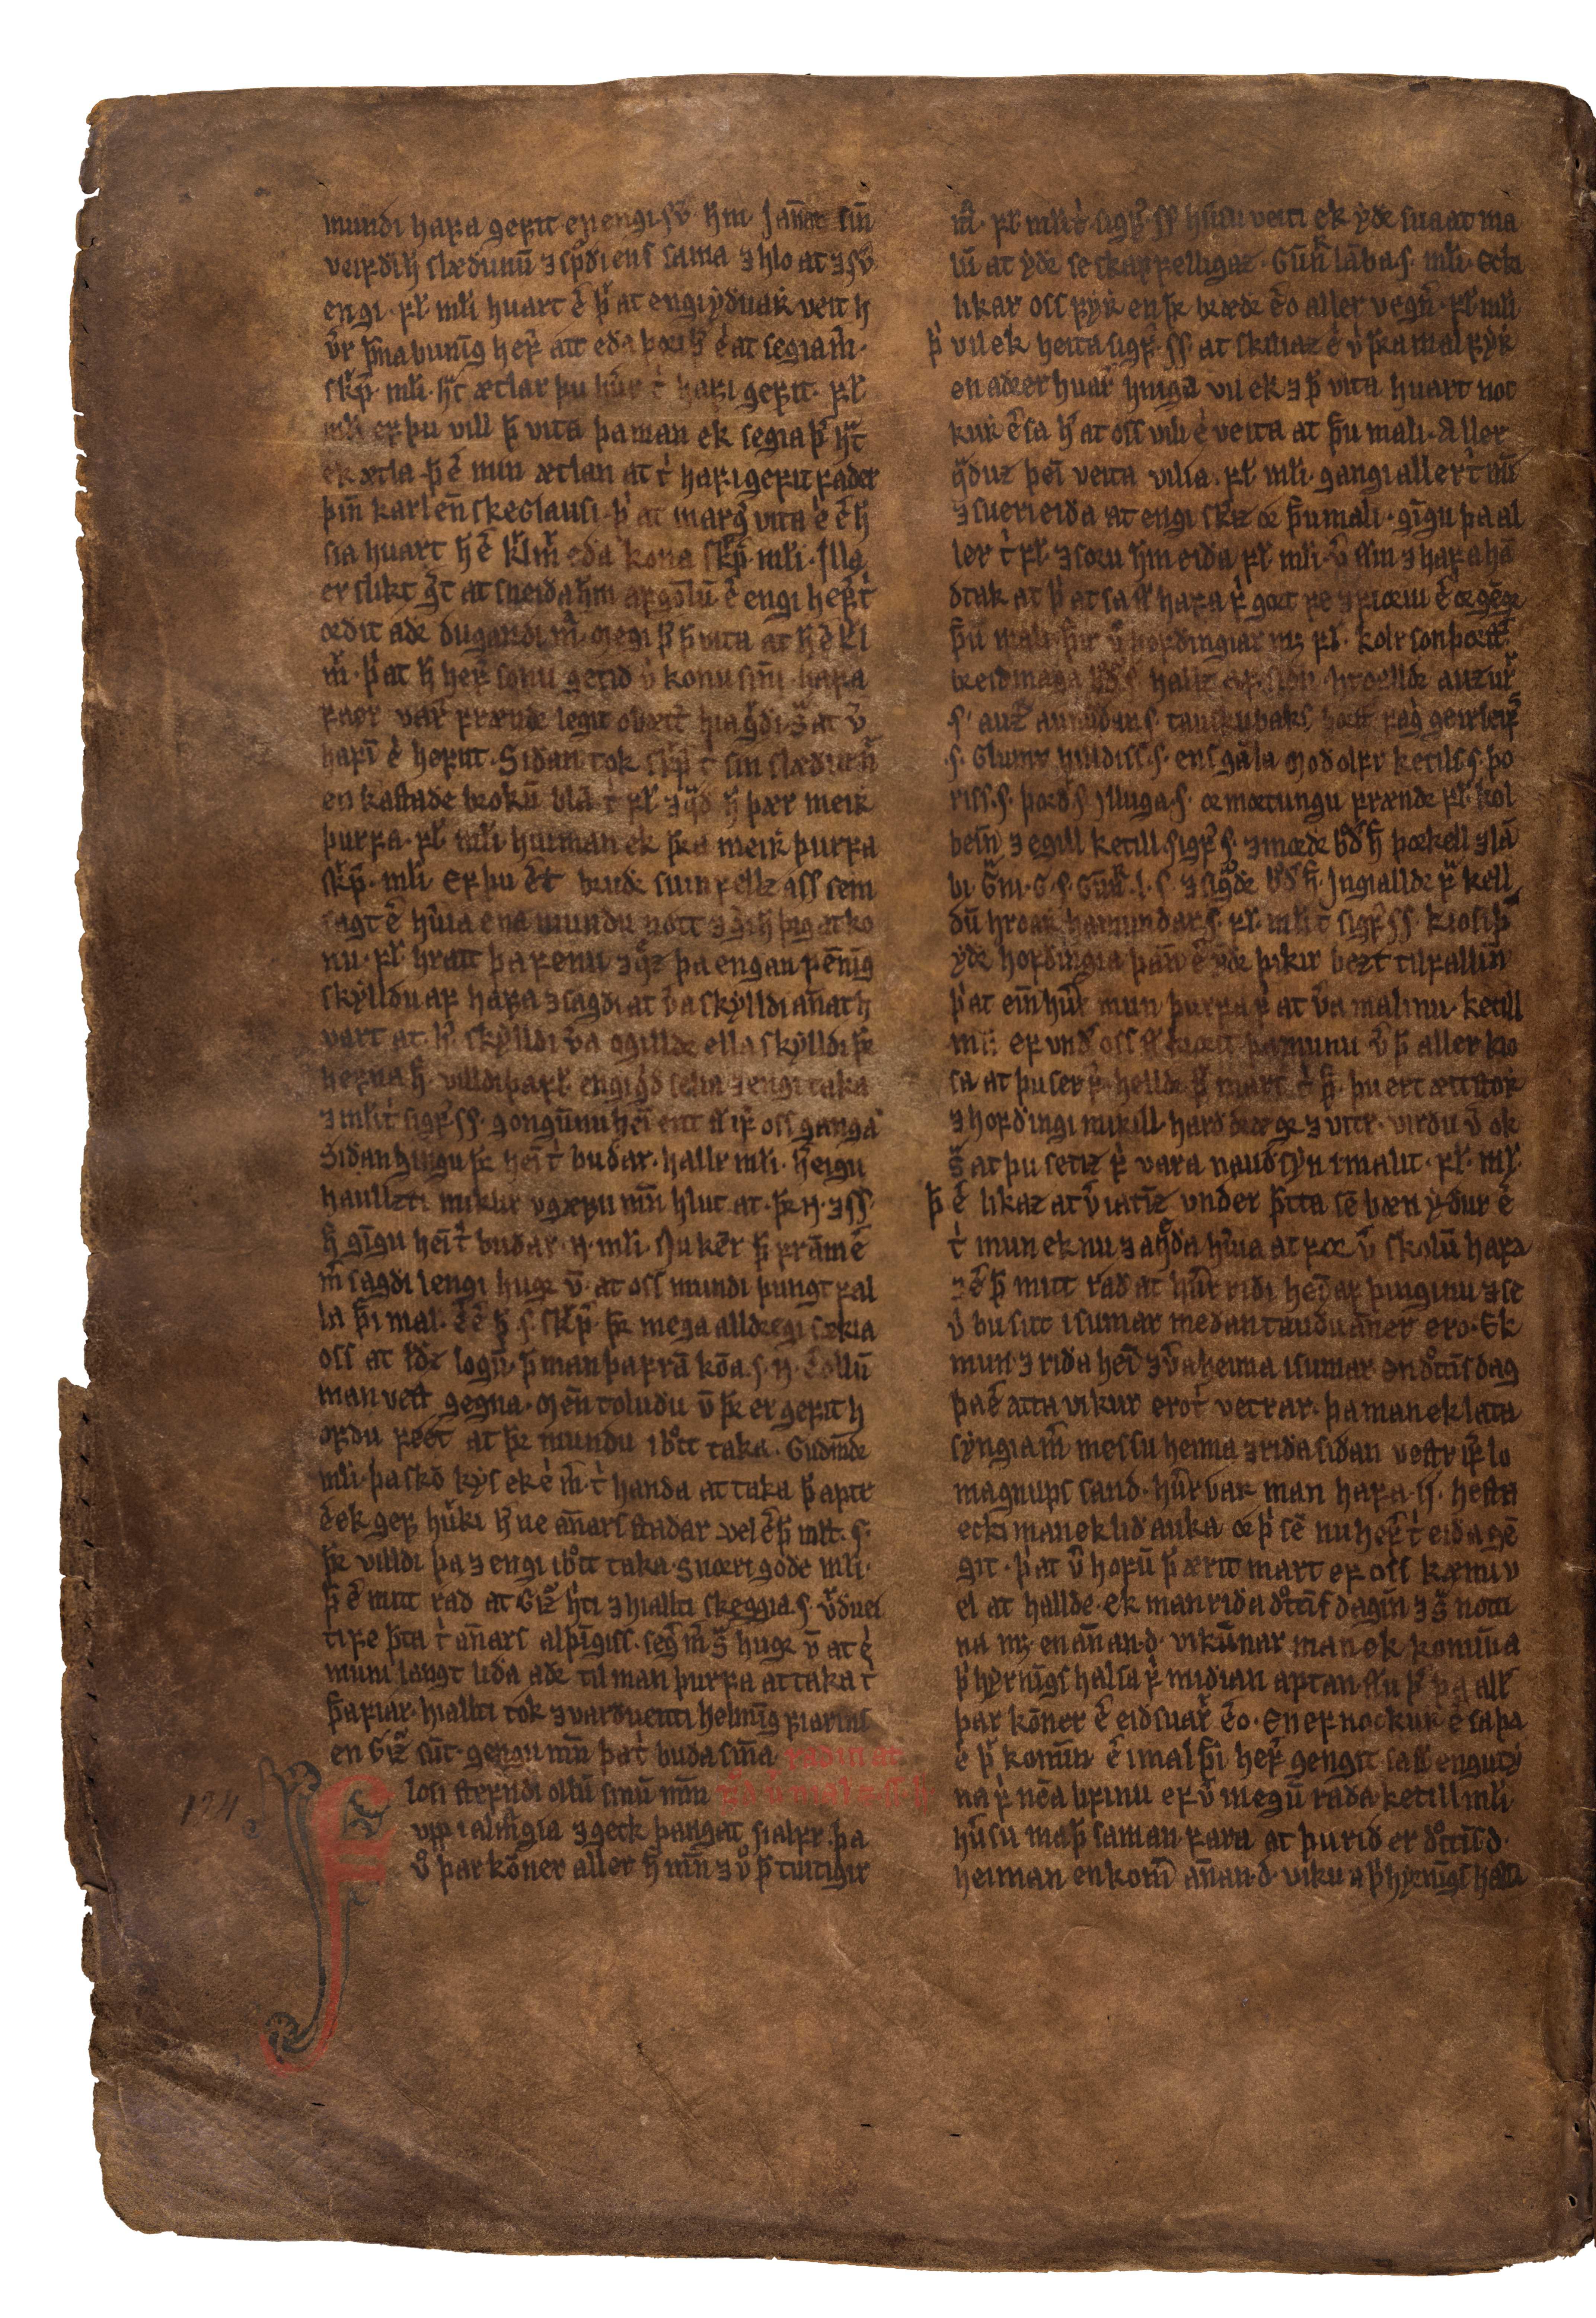 AM 132 fol - 43v